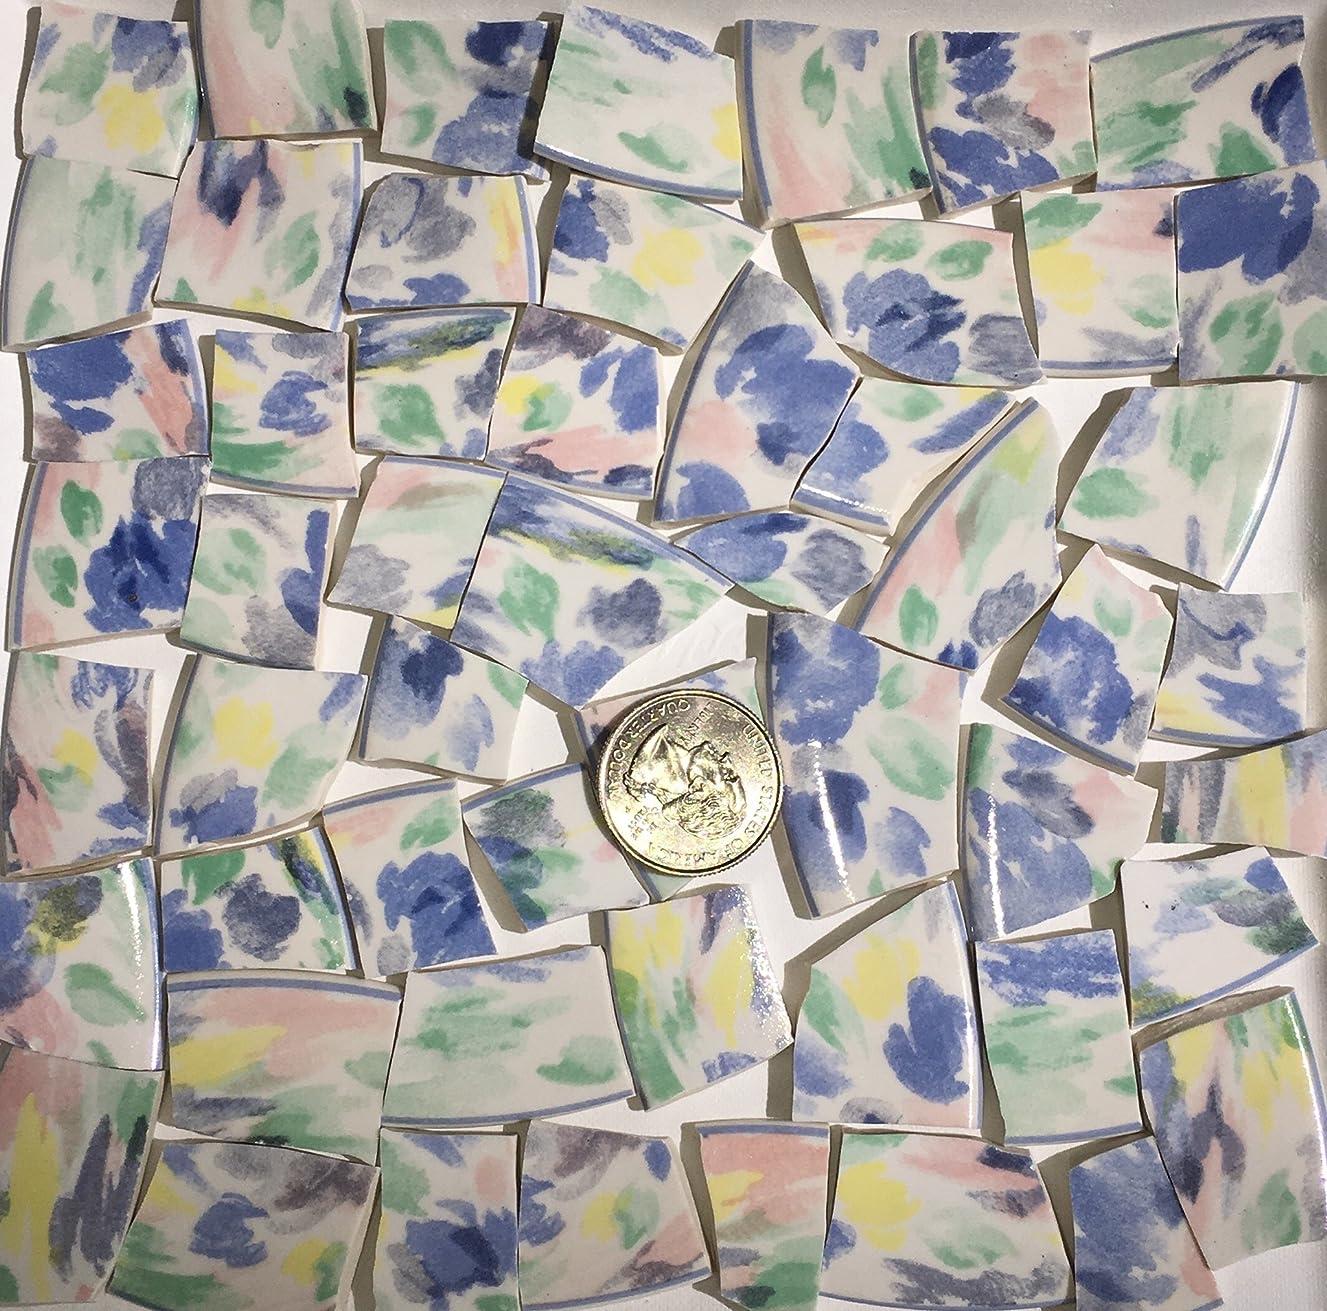 Mosaic Art & Craft Supply ~ Soft Pastel Abstract China Tiles (T#591)